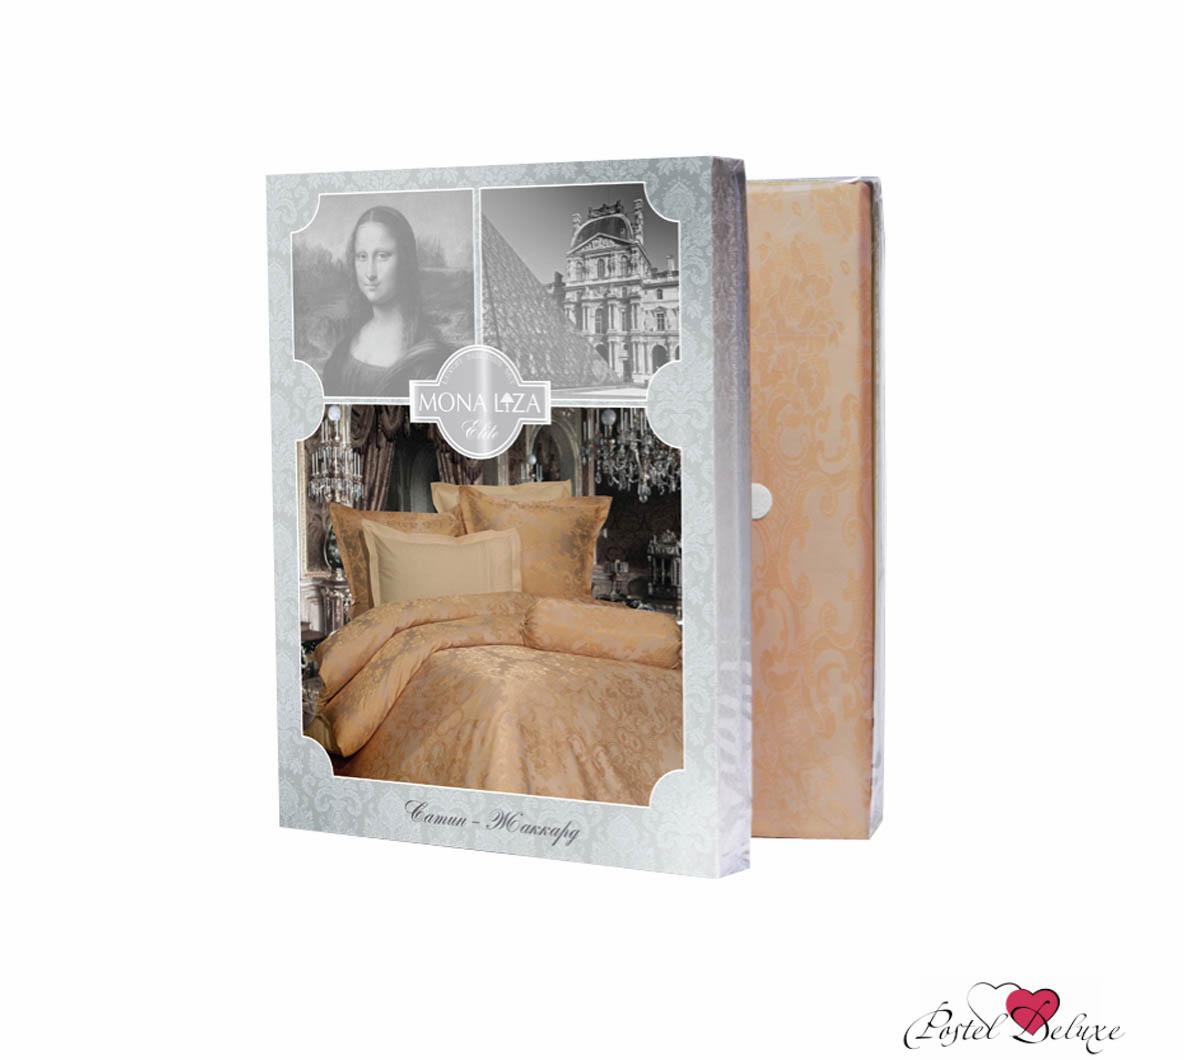 Постельное белье Mona Liza Постельное белье Madam Estelle (2 спал.) комплект пб 2 сп mona liza сатин жаккард royal 4 нав 2шт 70х70 и 2 шт